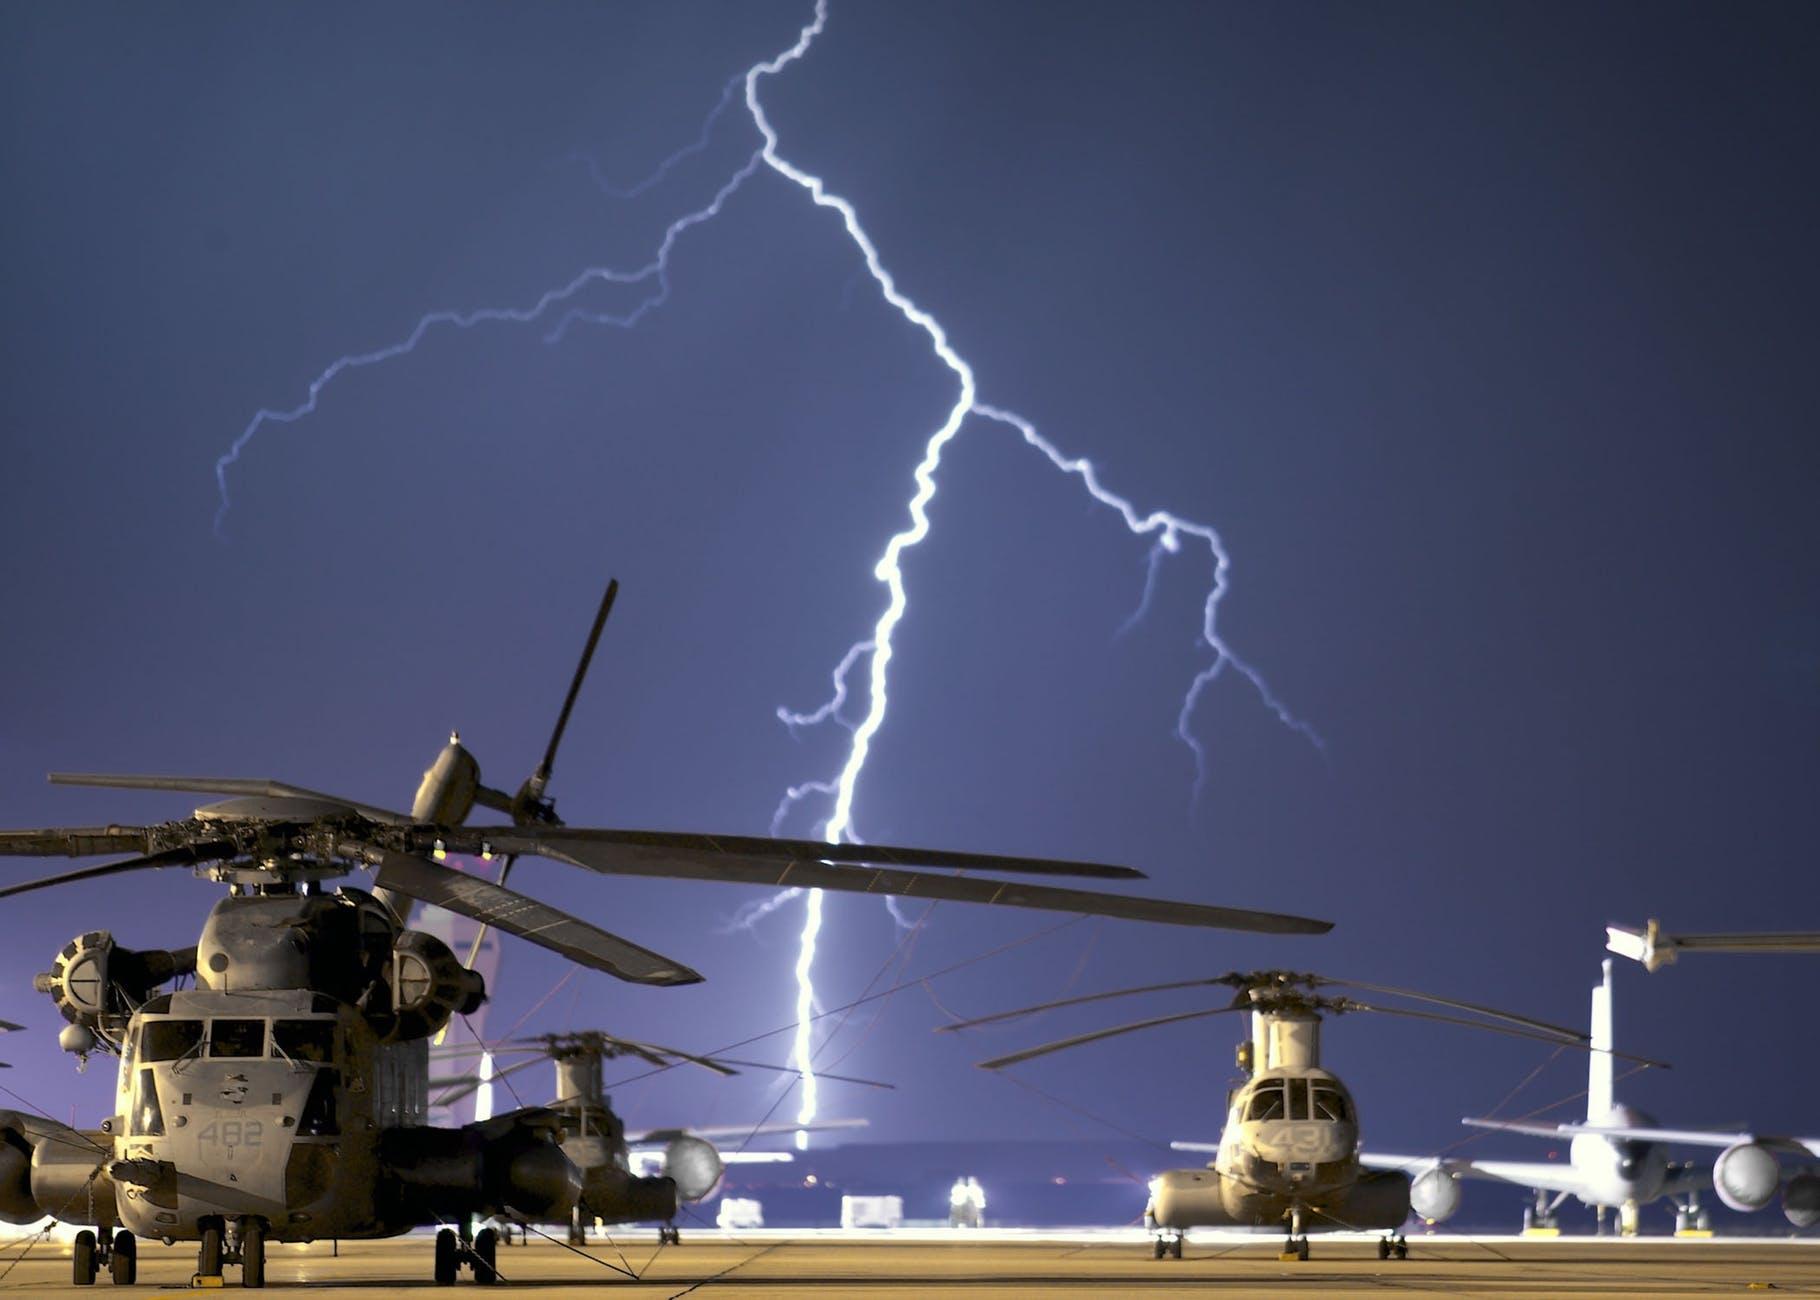 lightning-strike-night-storm-38541.jpeg